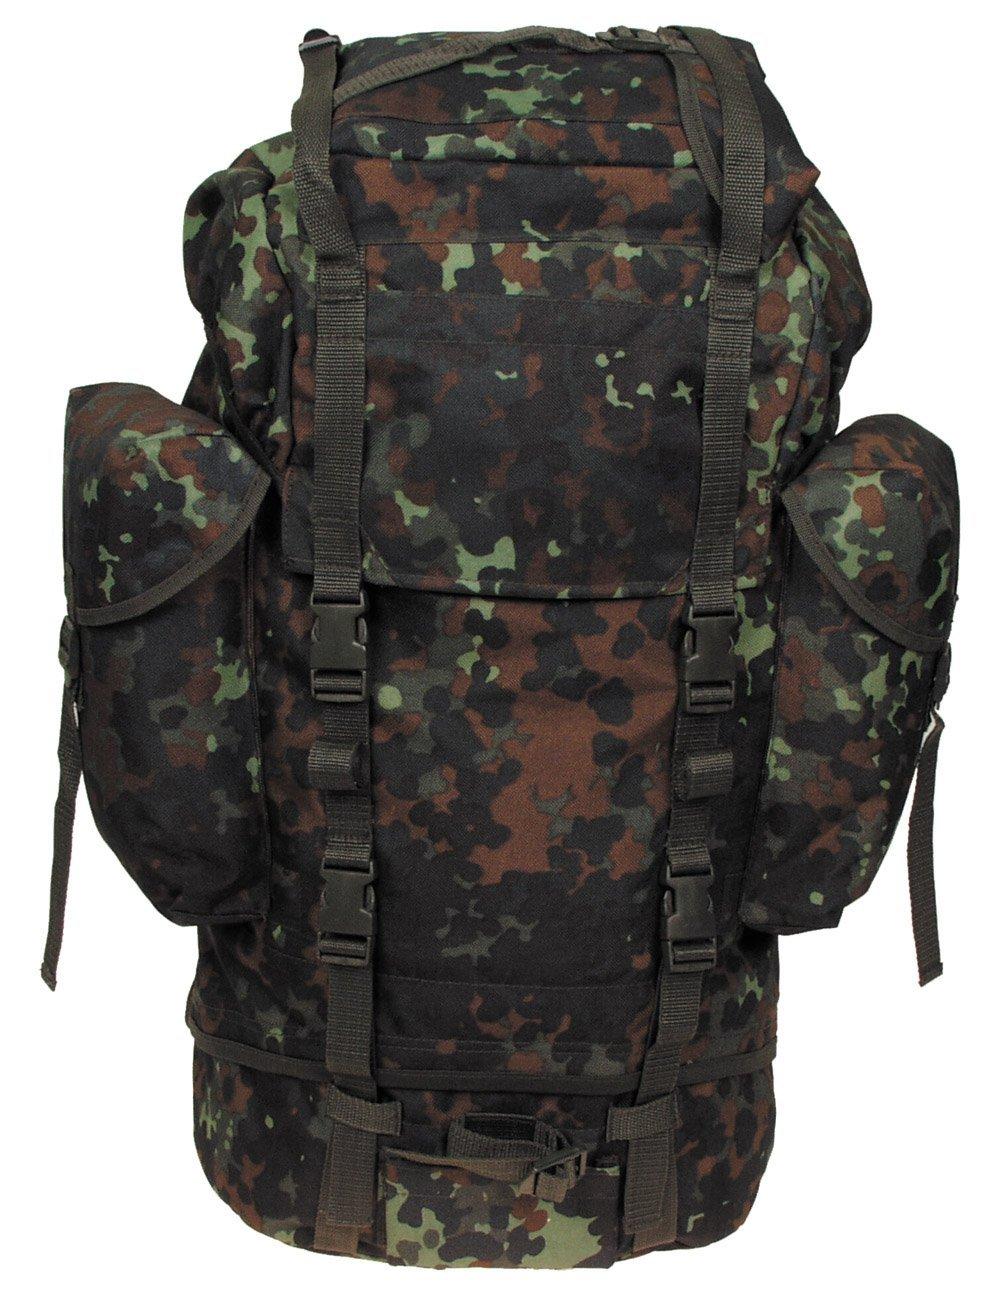 61bc7a204e66 Buy MFH German Army Rucksack 65L Flecktarn in Cheap Price on Alibaba.com